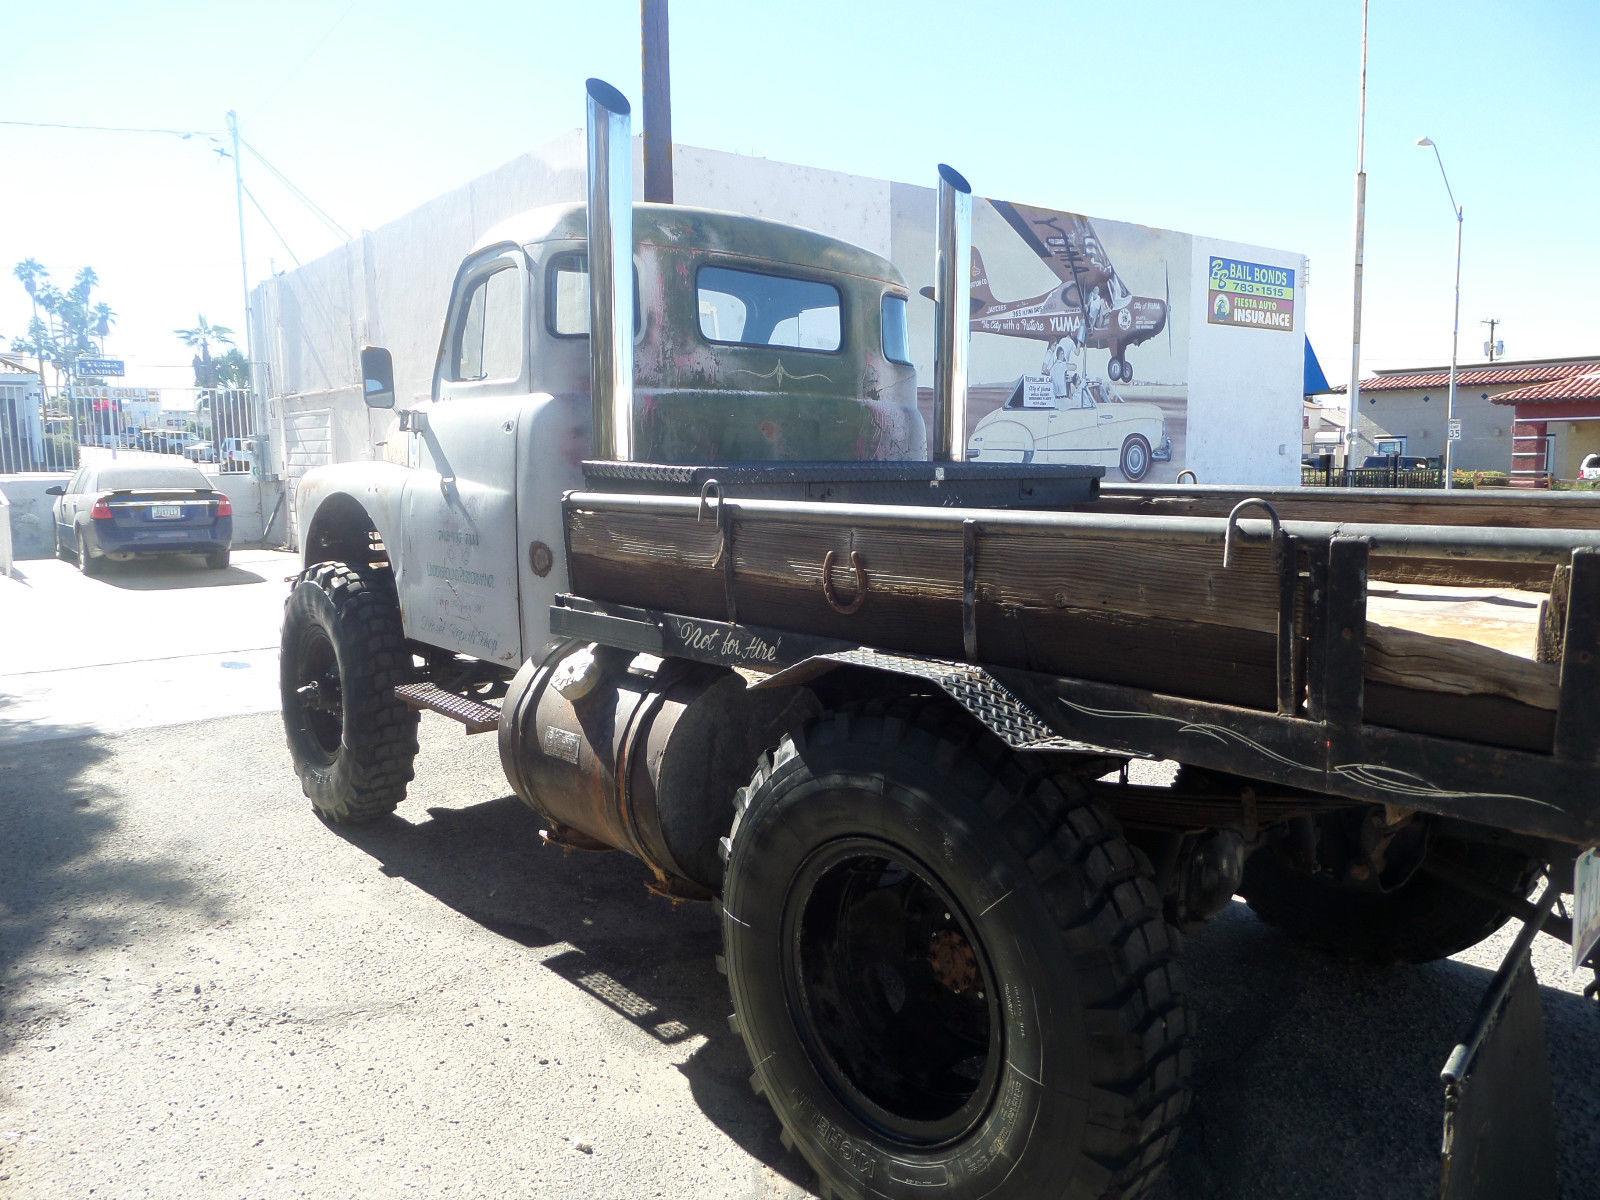 1949 Dodge Truck Cummins Diesel Power 4x4 Rat Rod Tow No Seat Reserve